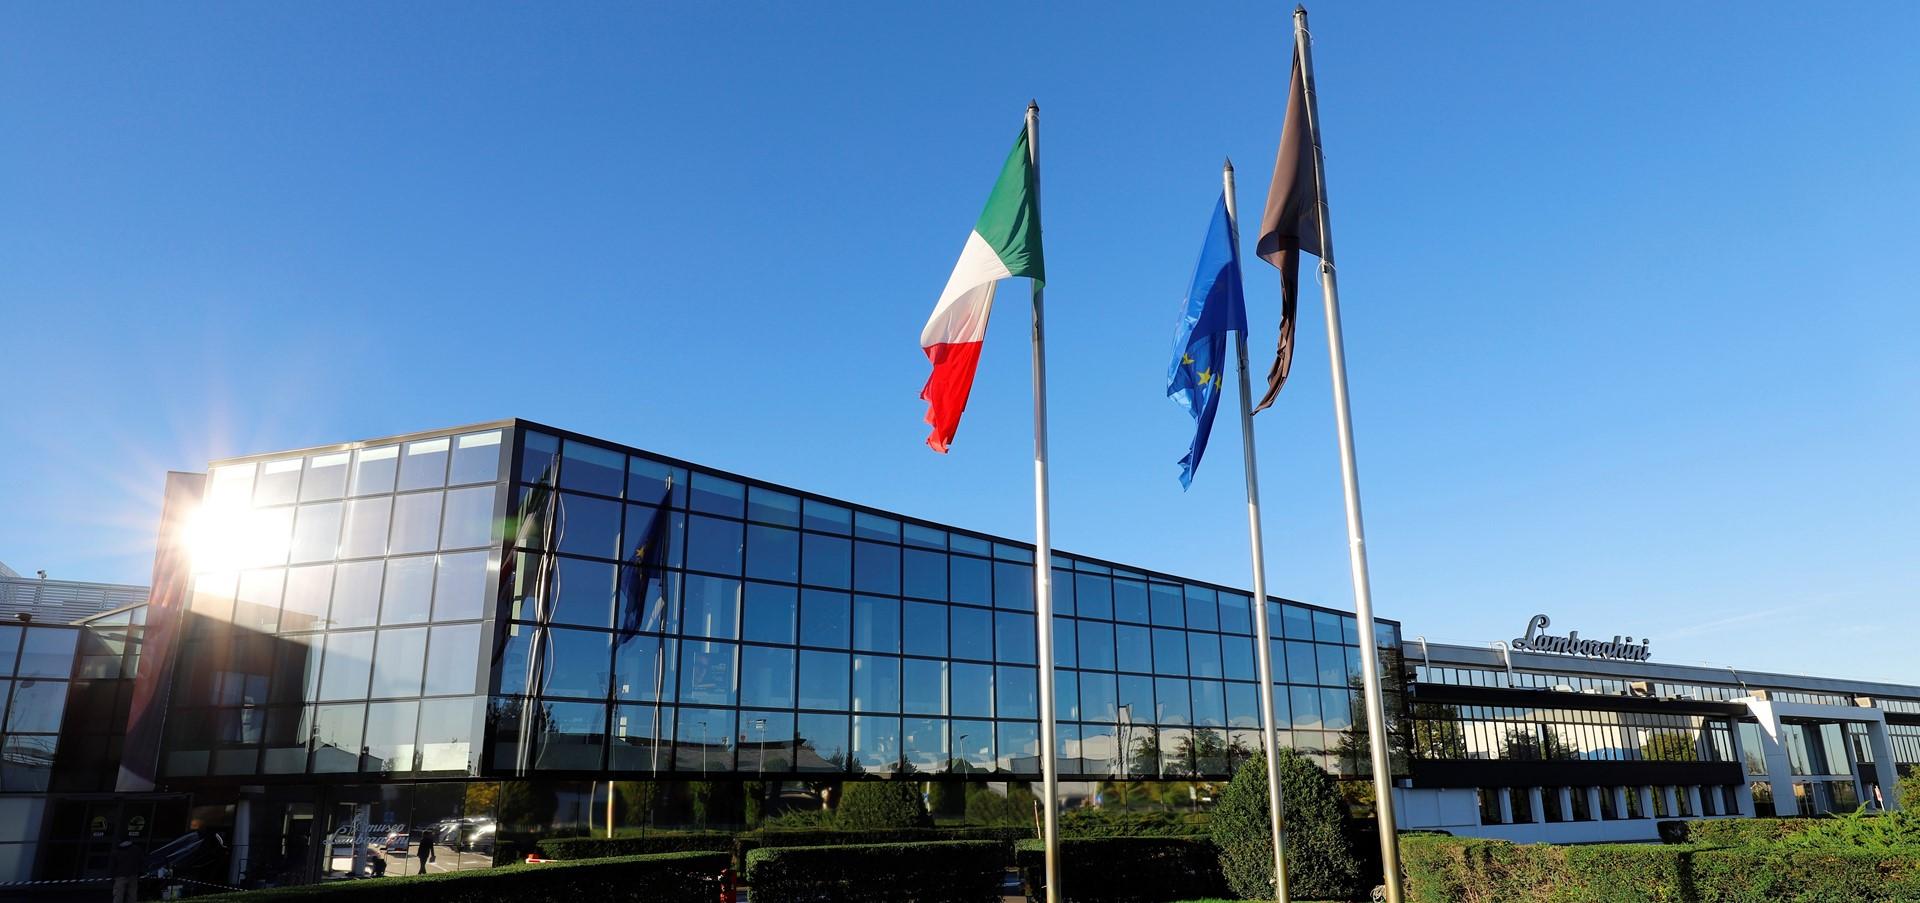 Automobili Lamborghini setzt seinen globalen Wachstumskurs..